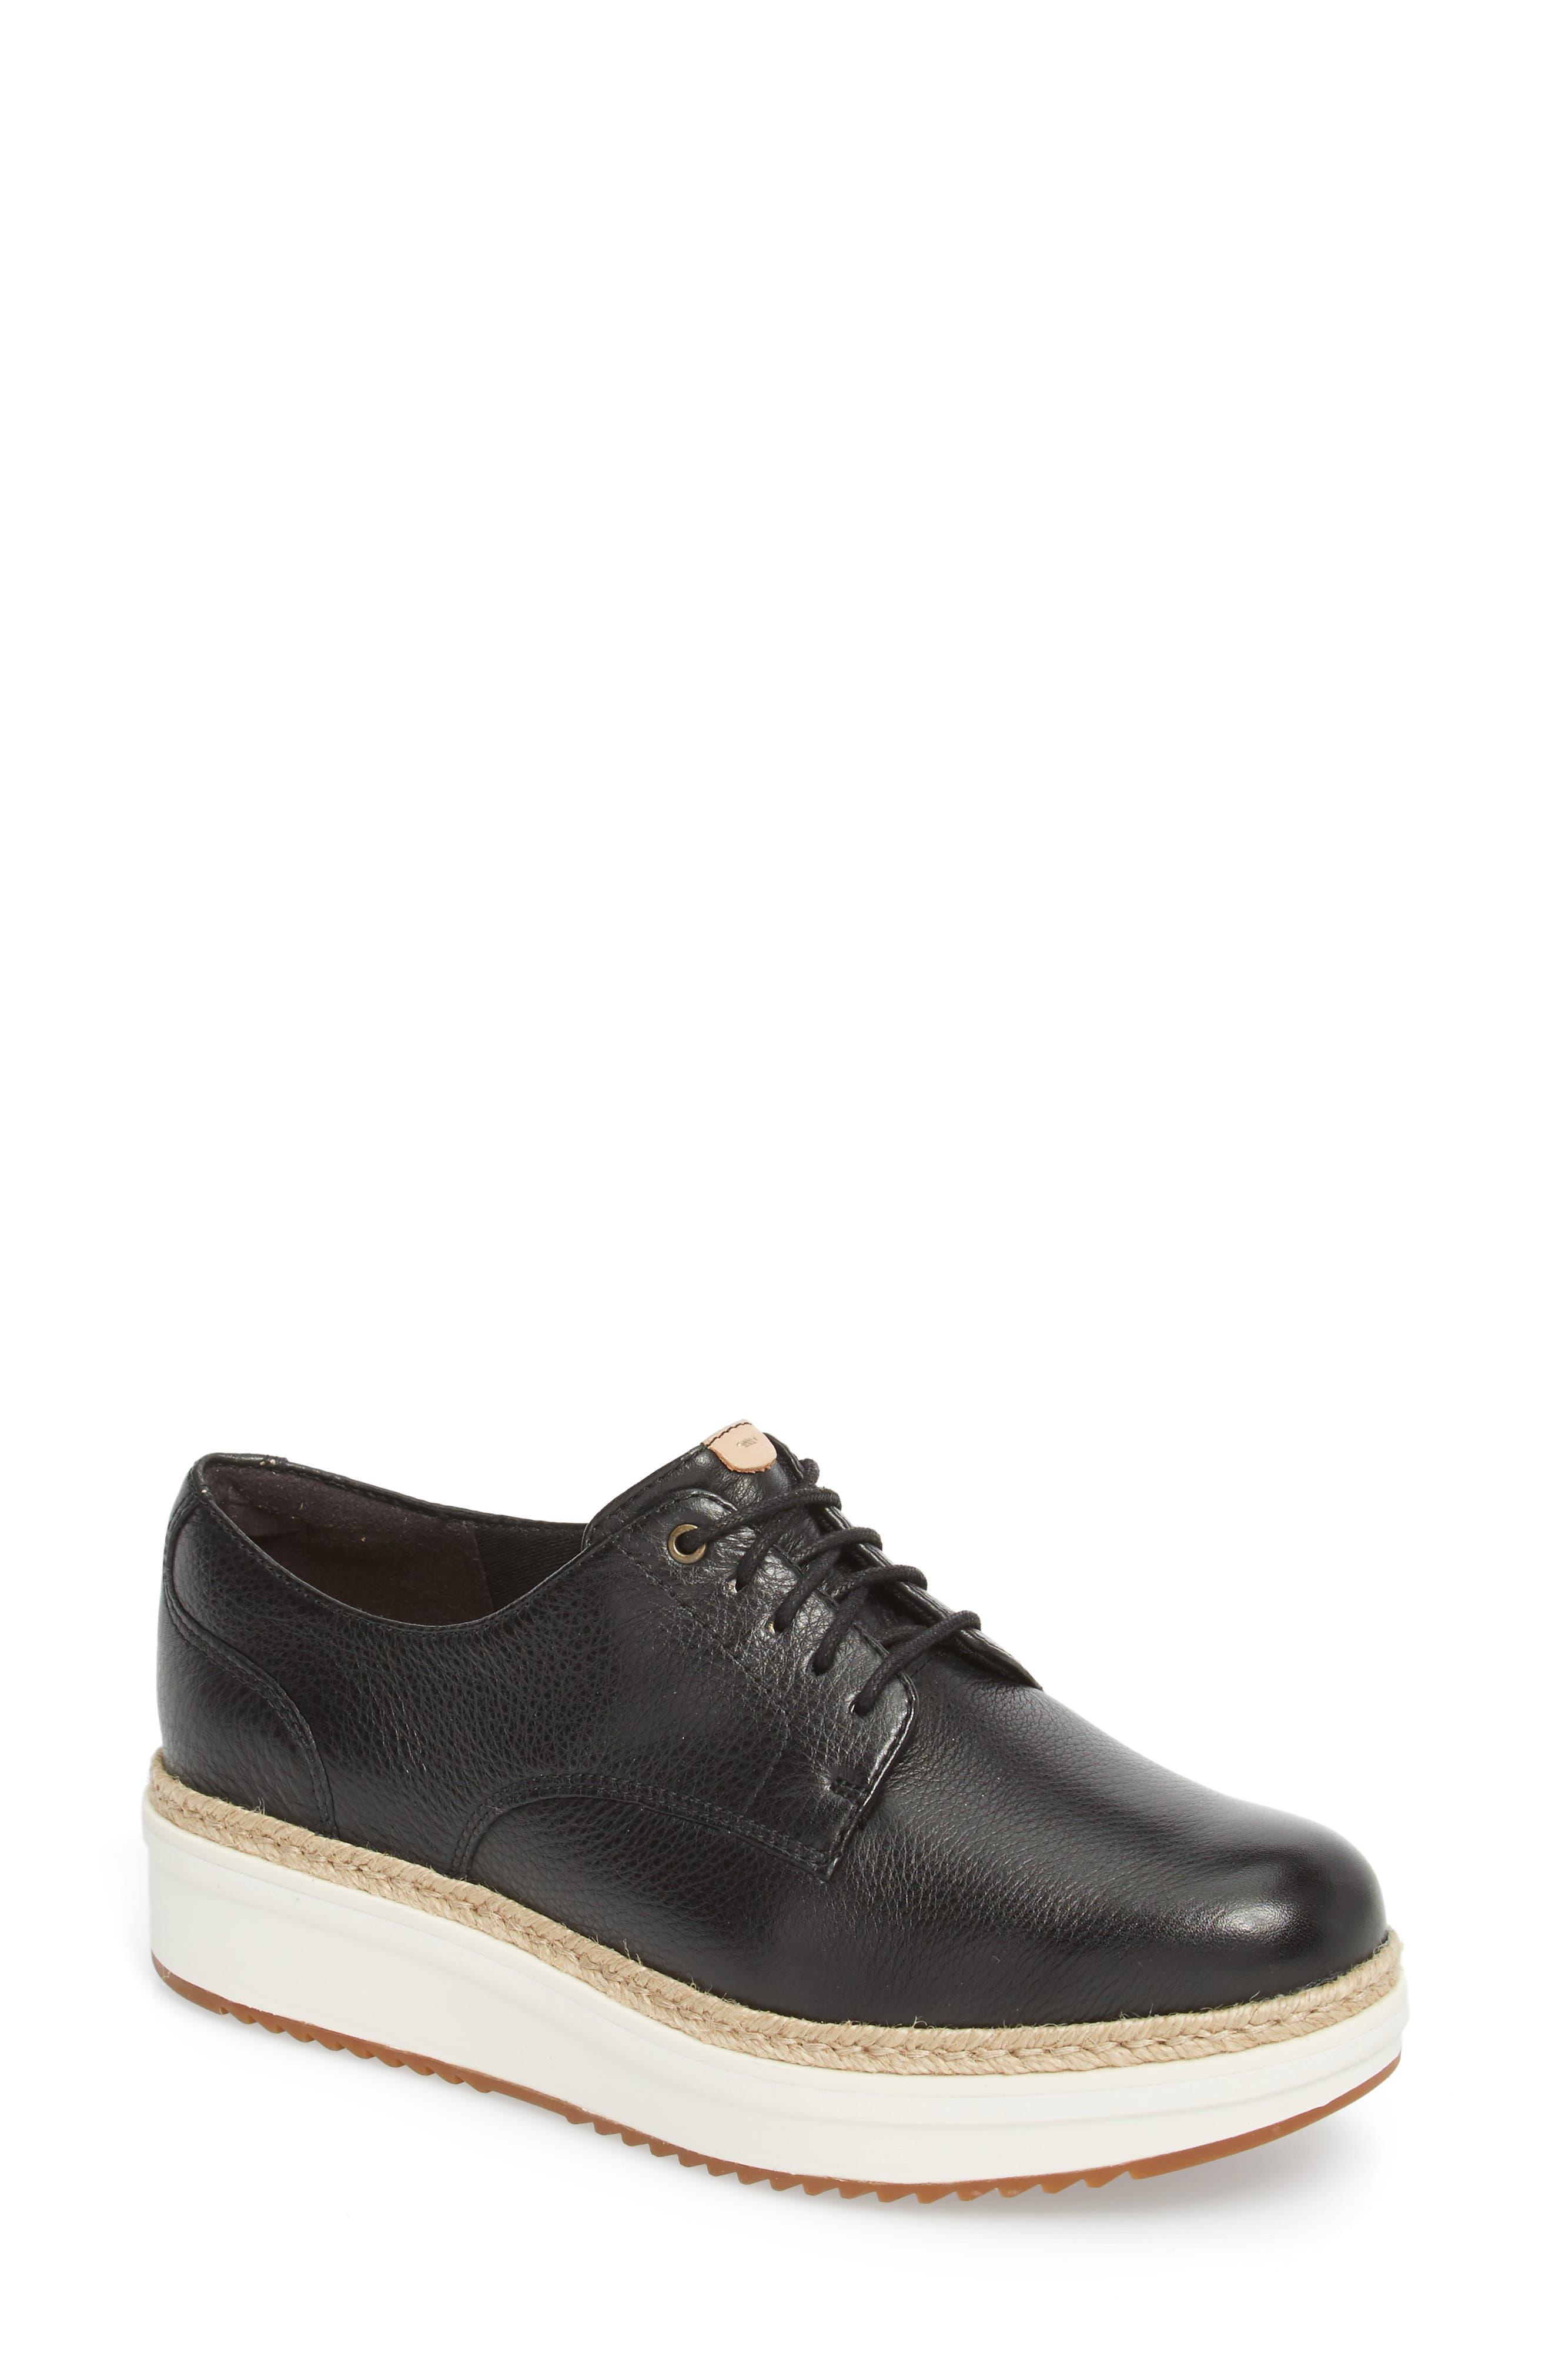 Teadale Rhea Sneaker,                         Main,                         color, 005